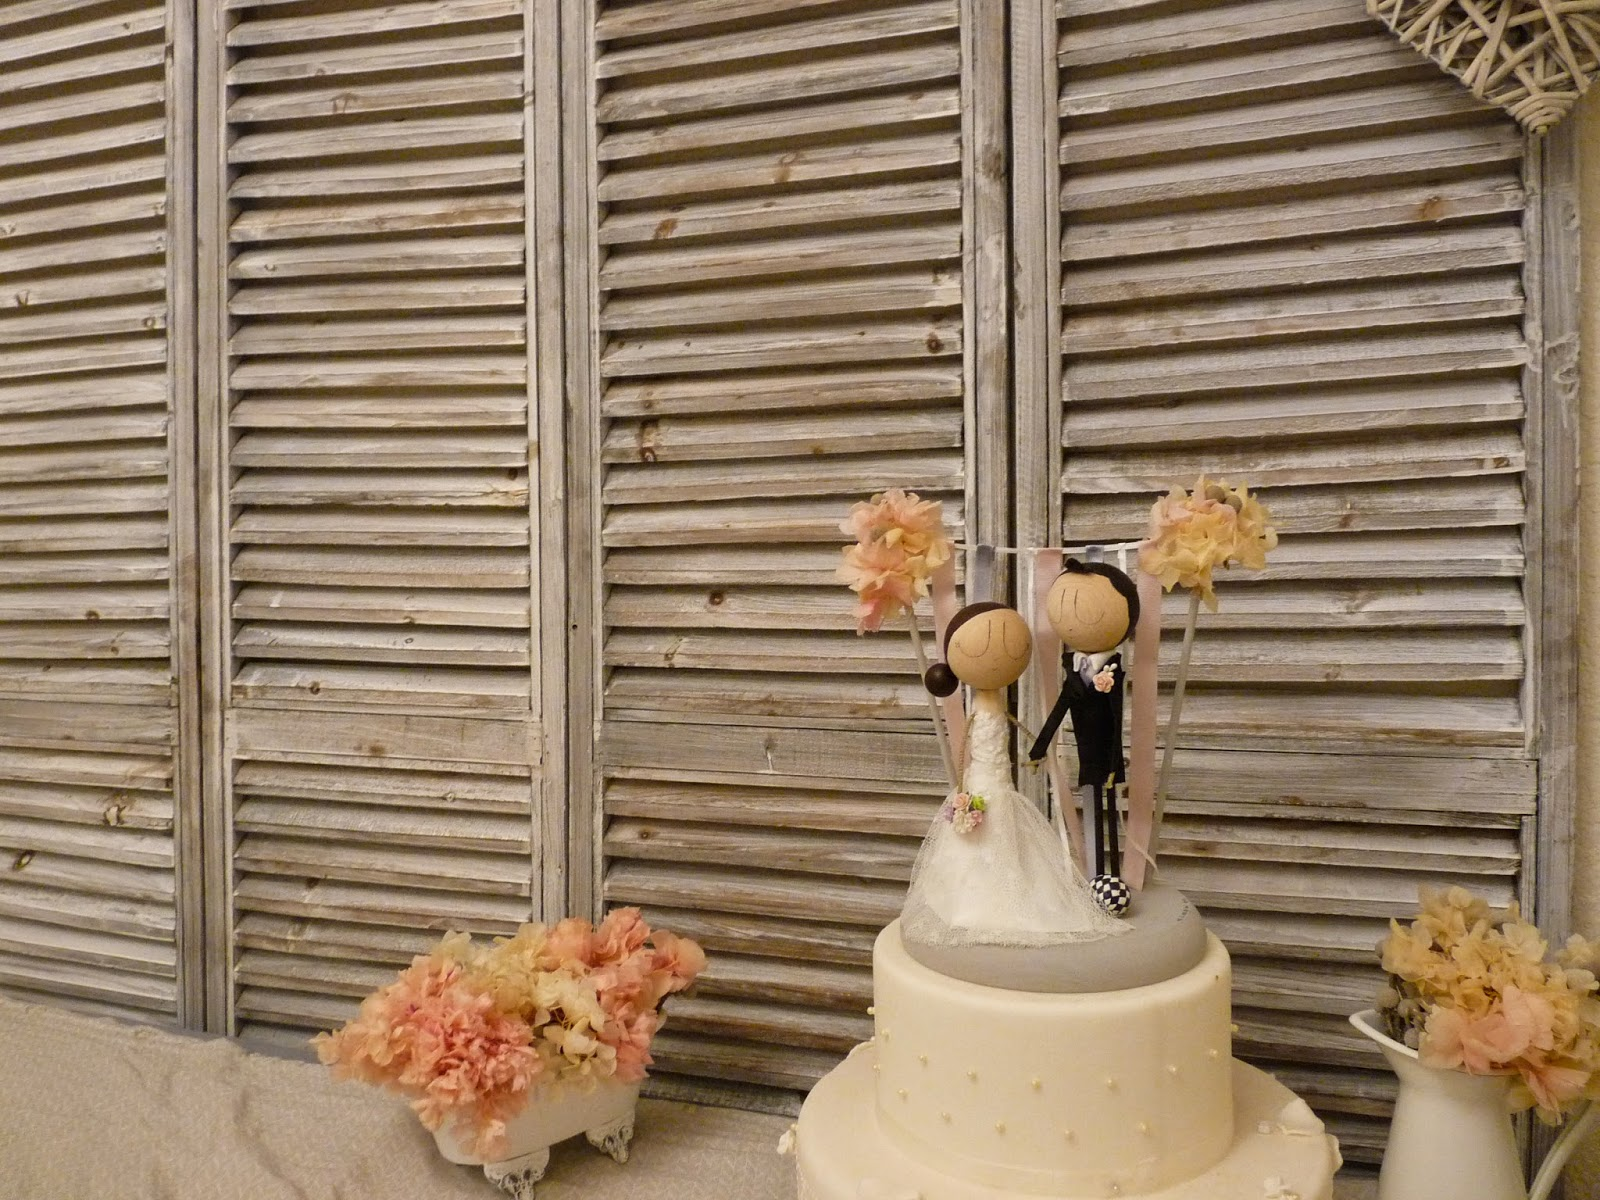 pronovias, novios pastel personalizados, figuras tarta, muñecos pastel, novios, novios originales, novios con encanto, wedding cake, topper cake, cake topper, bride,novia, novio, vestido novia, muñecos pastel personalizados, tarta boda, pastel nupcial, prometidos, nos casamos, novios de pastel elegante, con encanto, maleta, viaje de novios, ramo de novia, peinado novia, corbata novio, restaurante bodas, mrymrsbyani, mr&mrsbyani, wedding topper cake